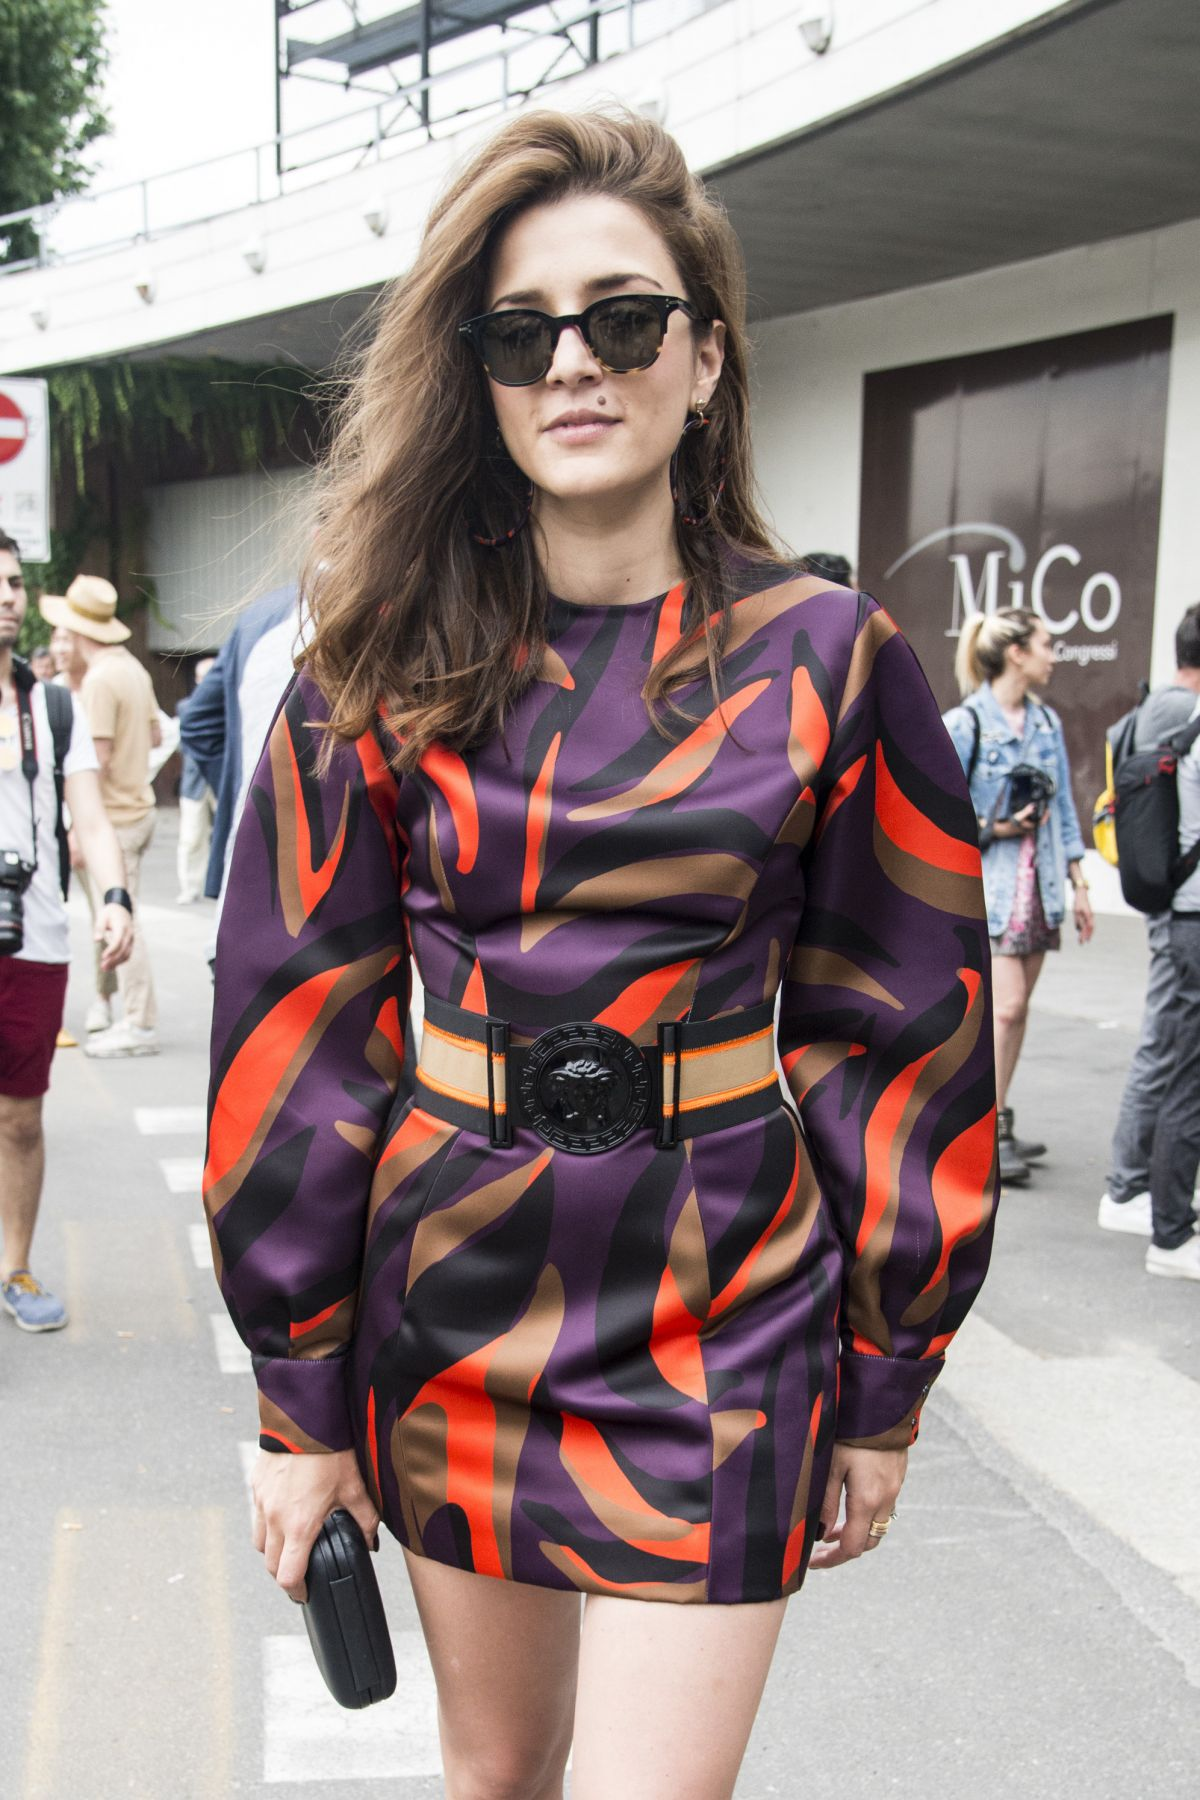 ELEONORA CARISI at Versace Fashion Show in Milan 06/18/2016